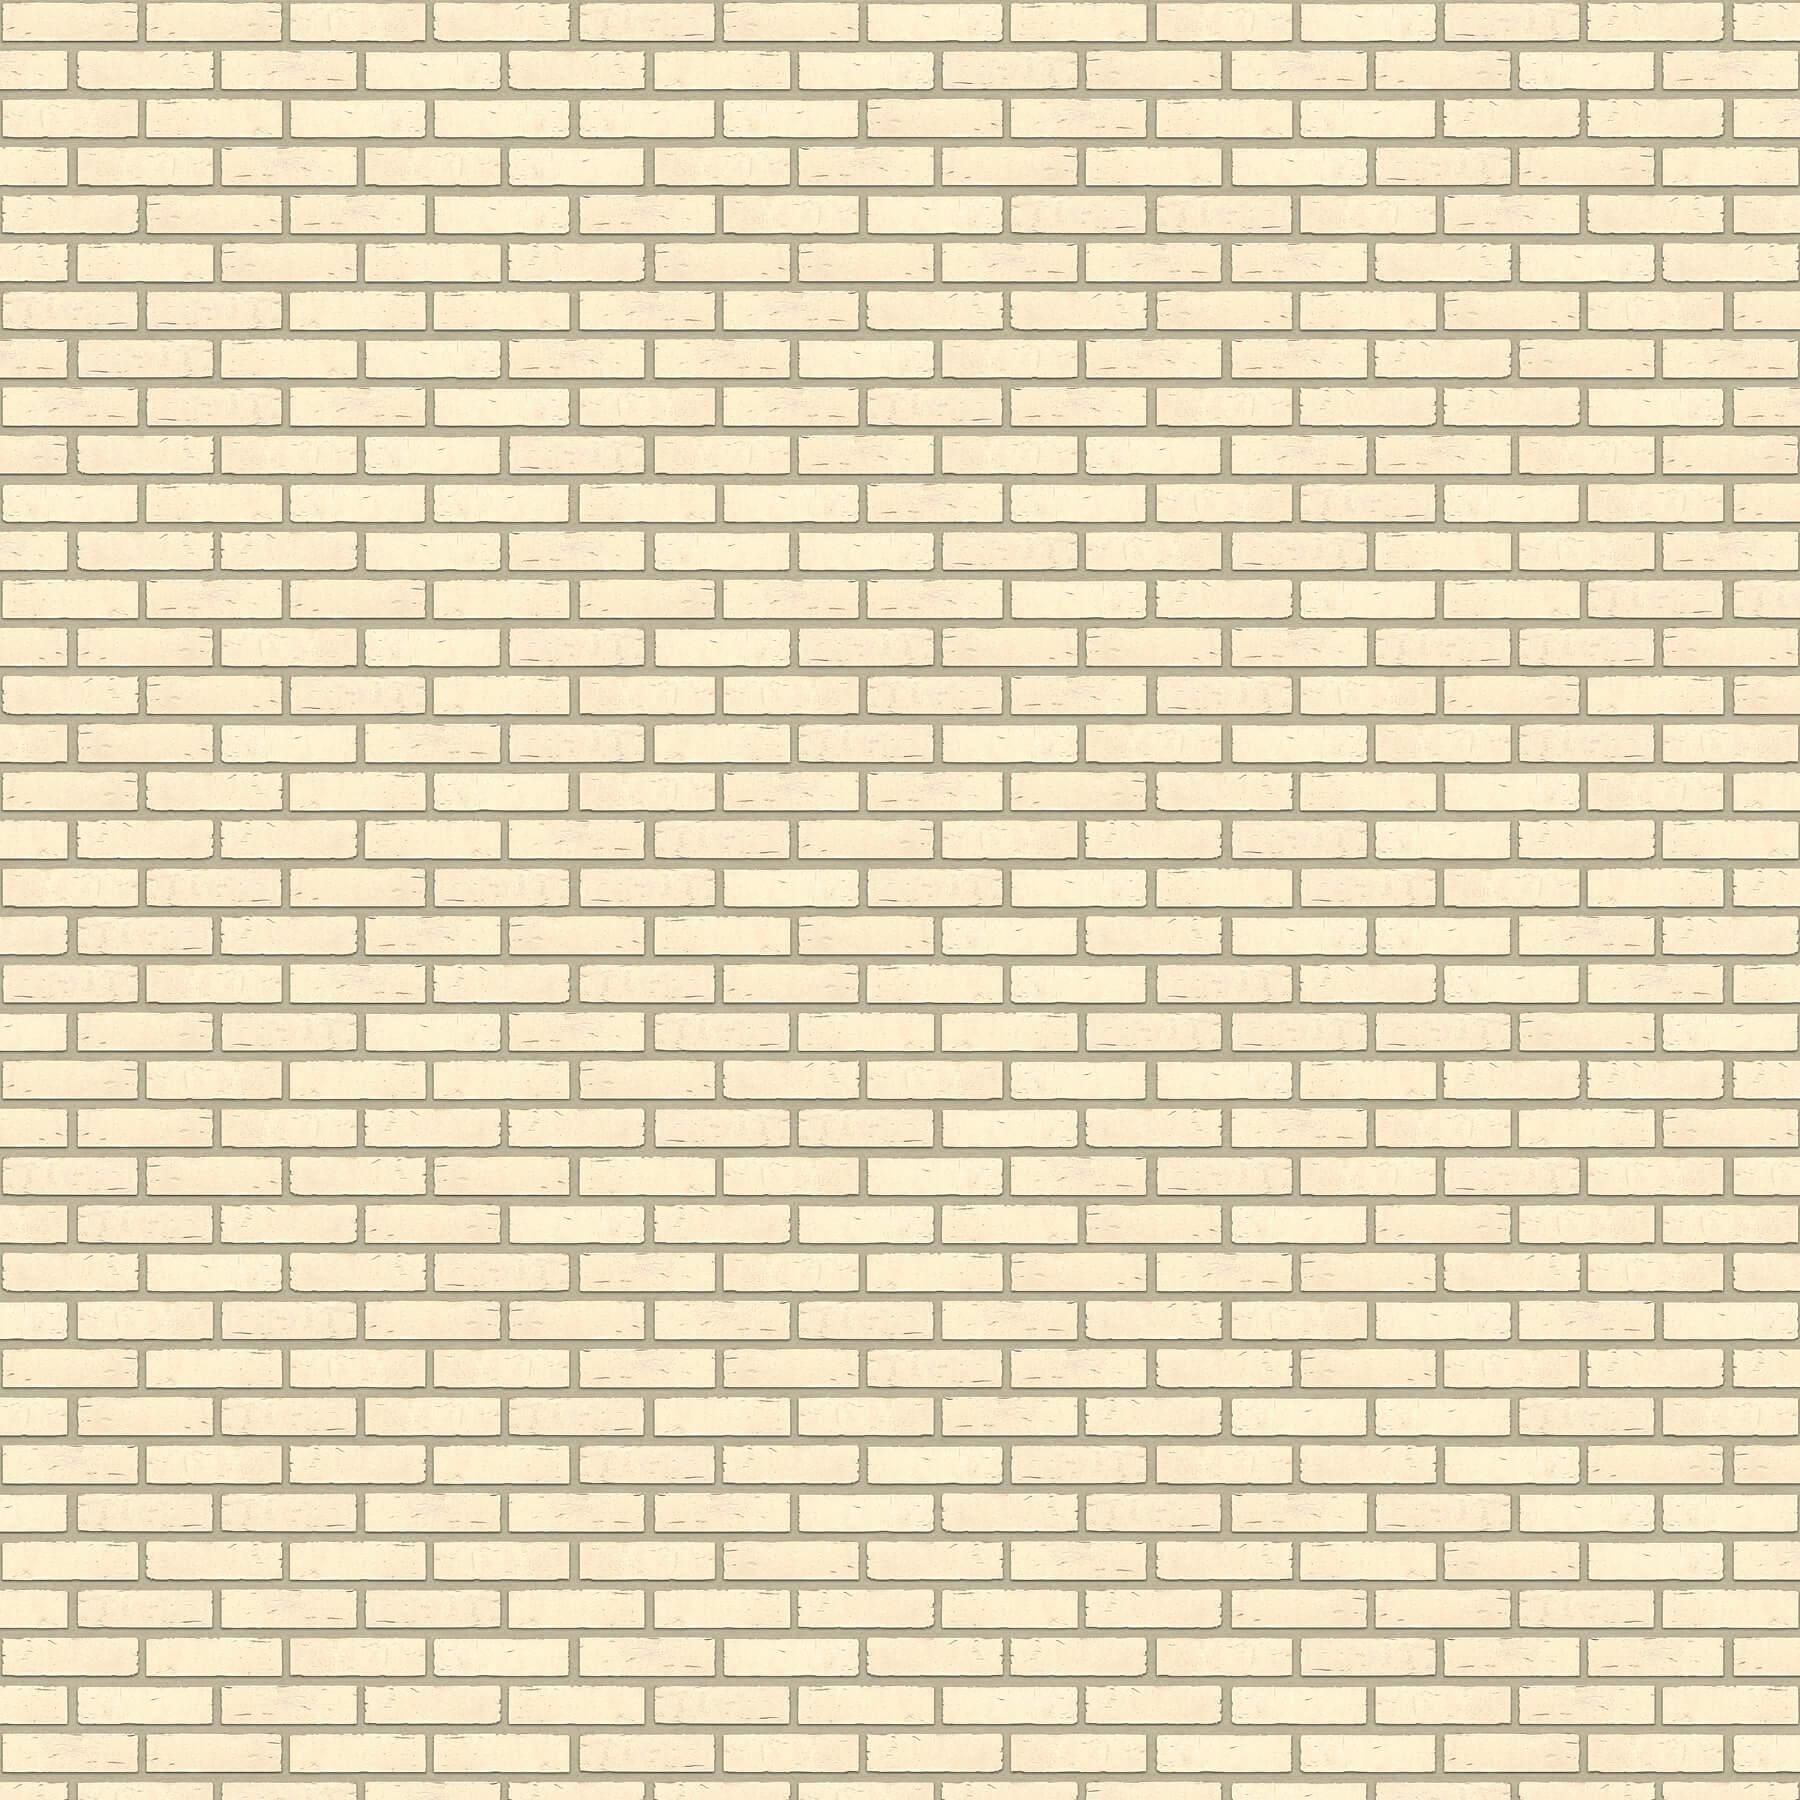 Dekorativna cigla listela FeldHaus Klinker r-763 nf Bez